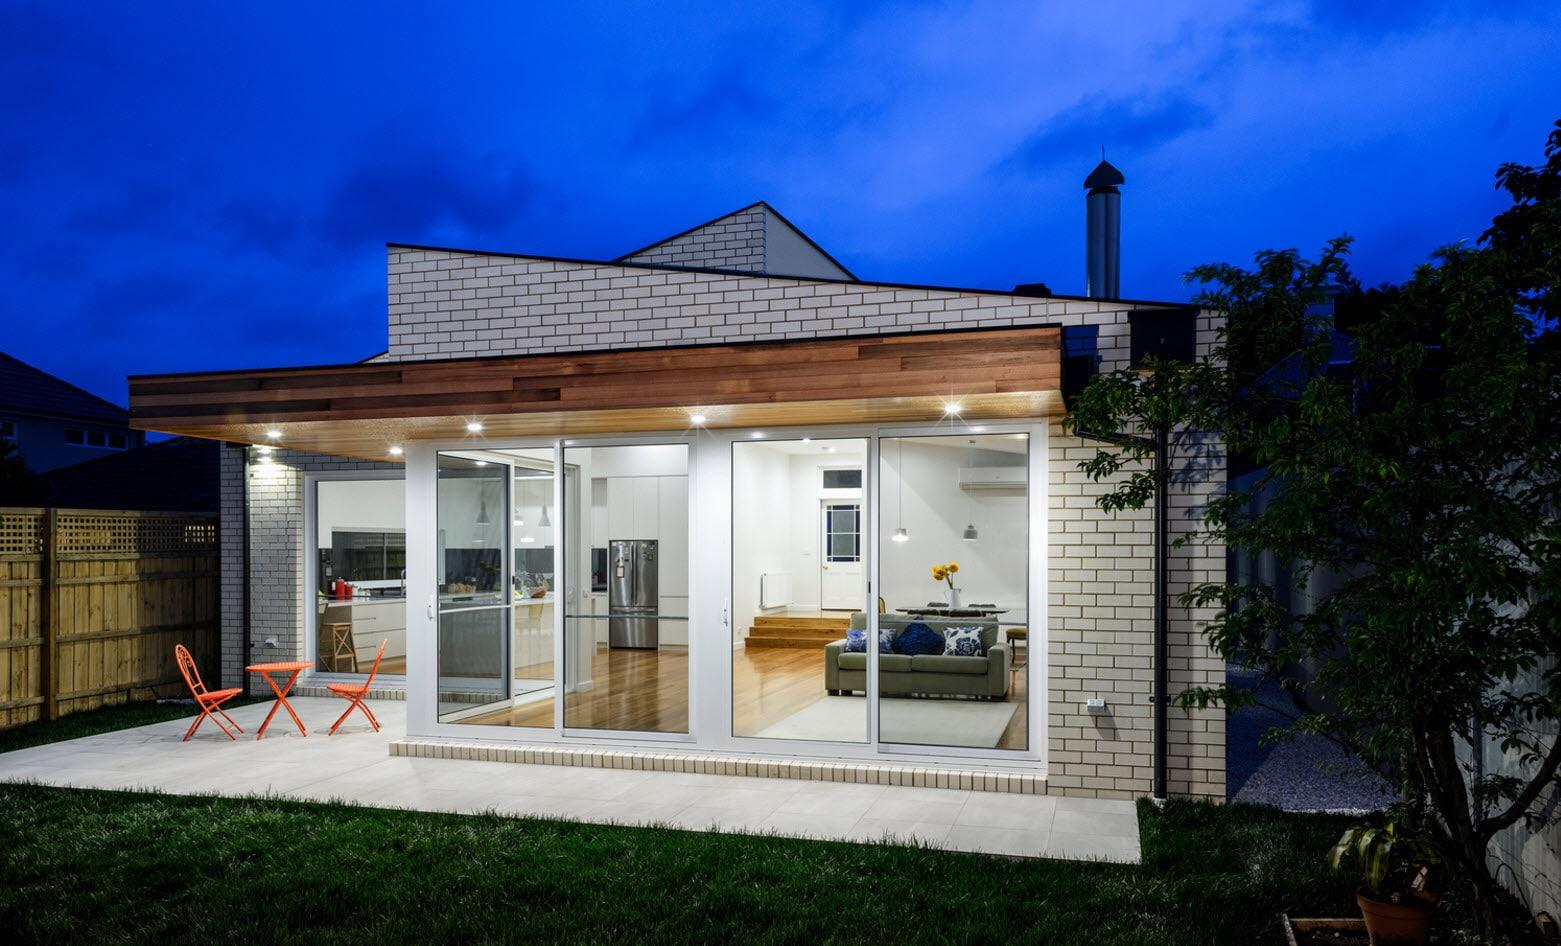 Dise o de casa moderna de un piso planos y fachadas for Viviendas modernas de una planta